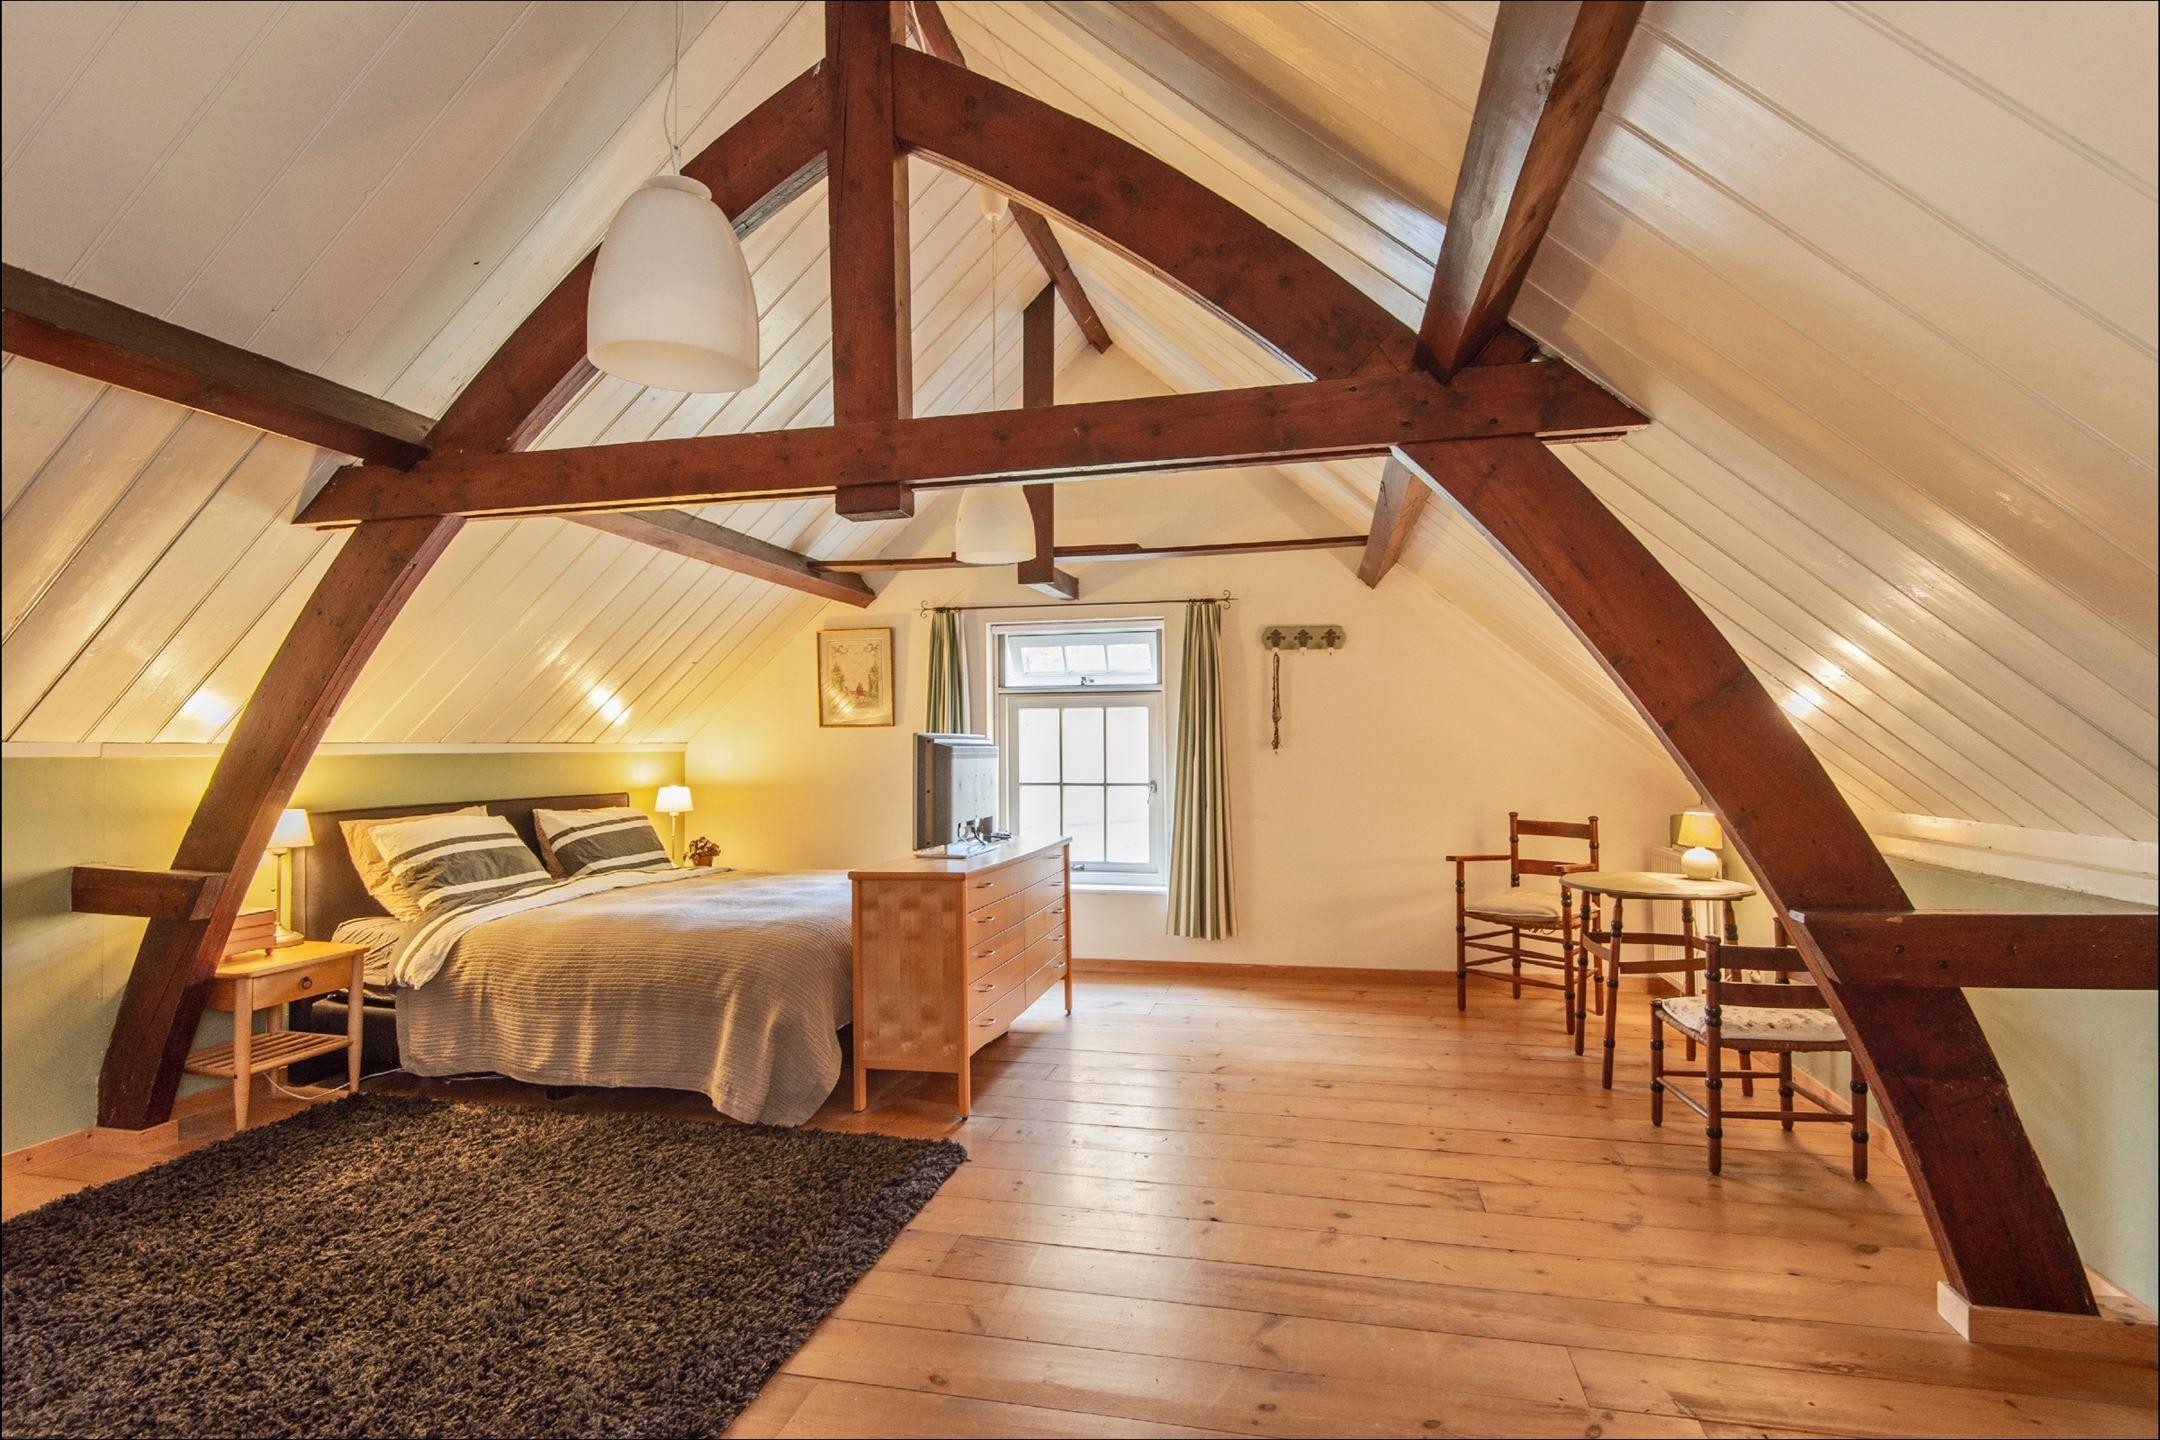 12x Vliering Inspiratie : Halve vliering interior railing t bedroom attic and attic